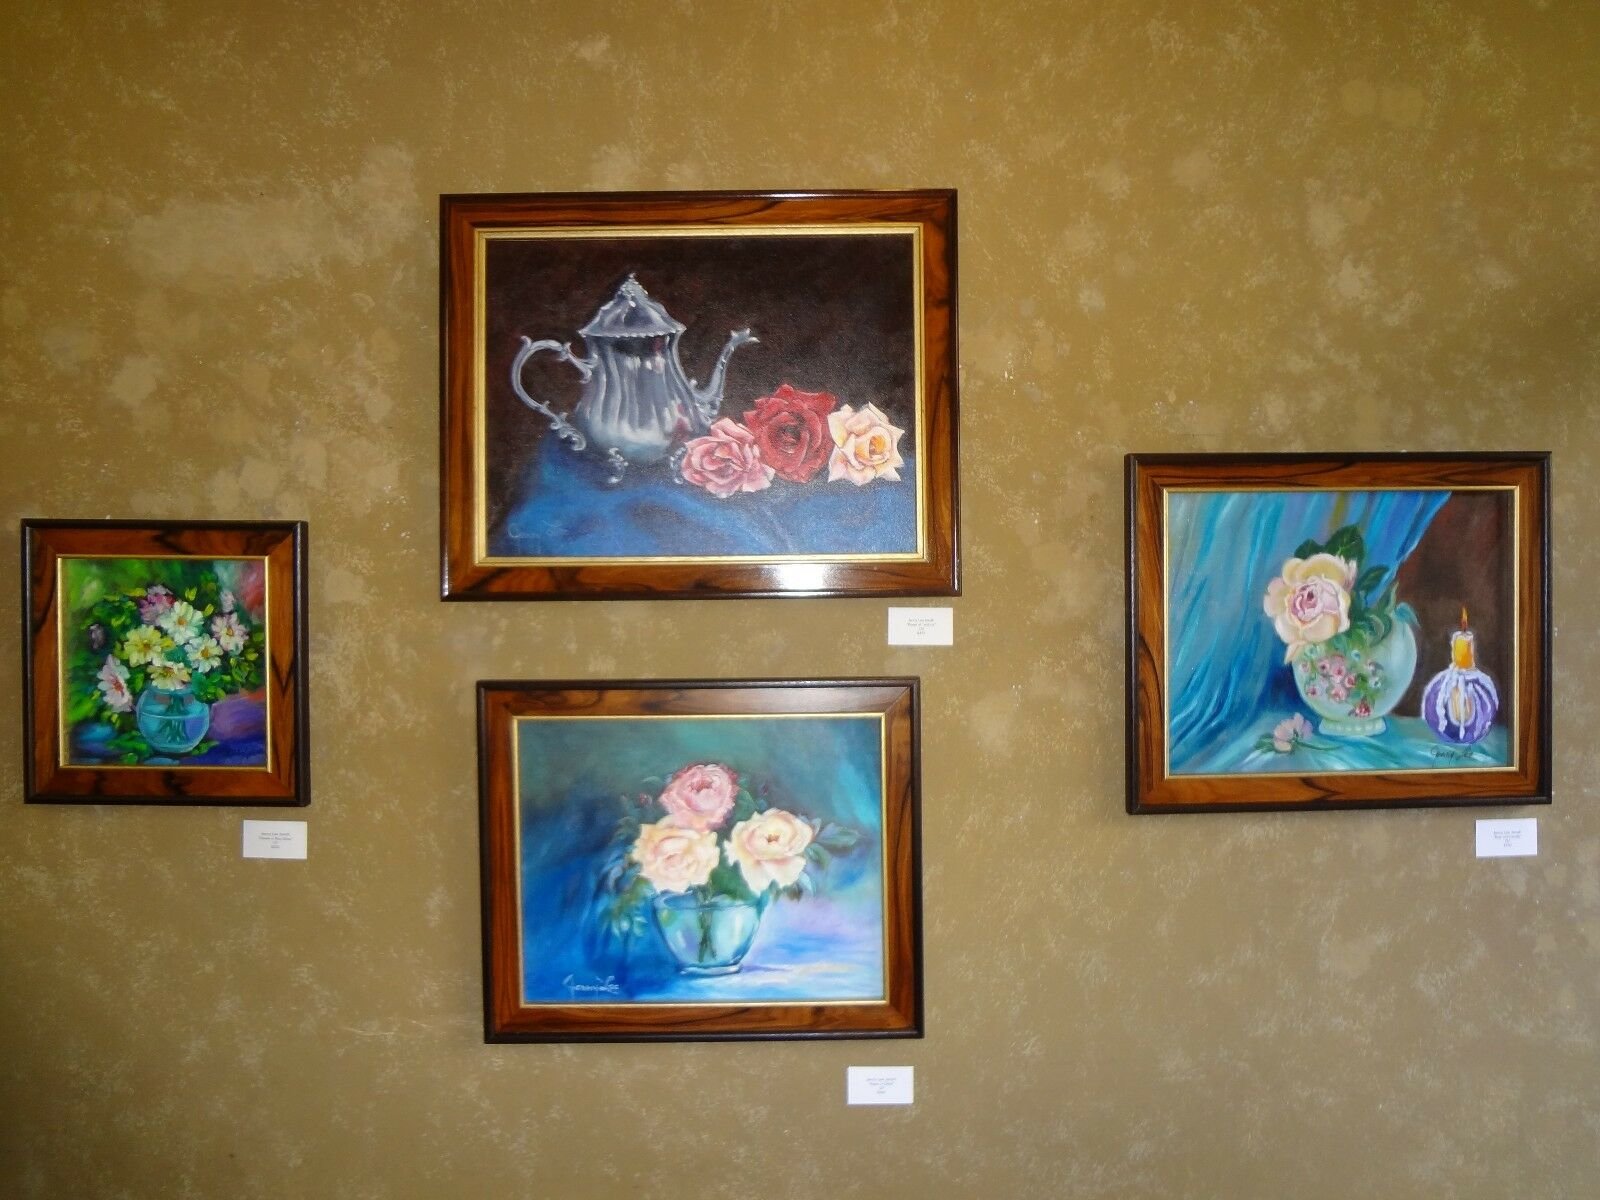 Birds Of The World Realism, Original Oil Painting ART DECO  - $39.00